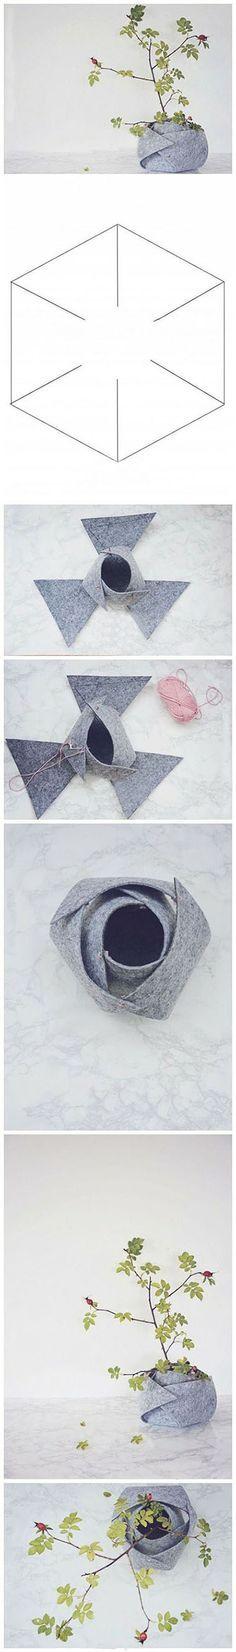 So Cute Bonsai | DIY & Crafts Tutorials